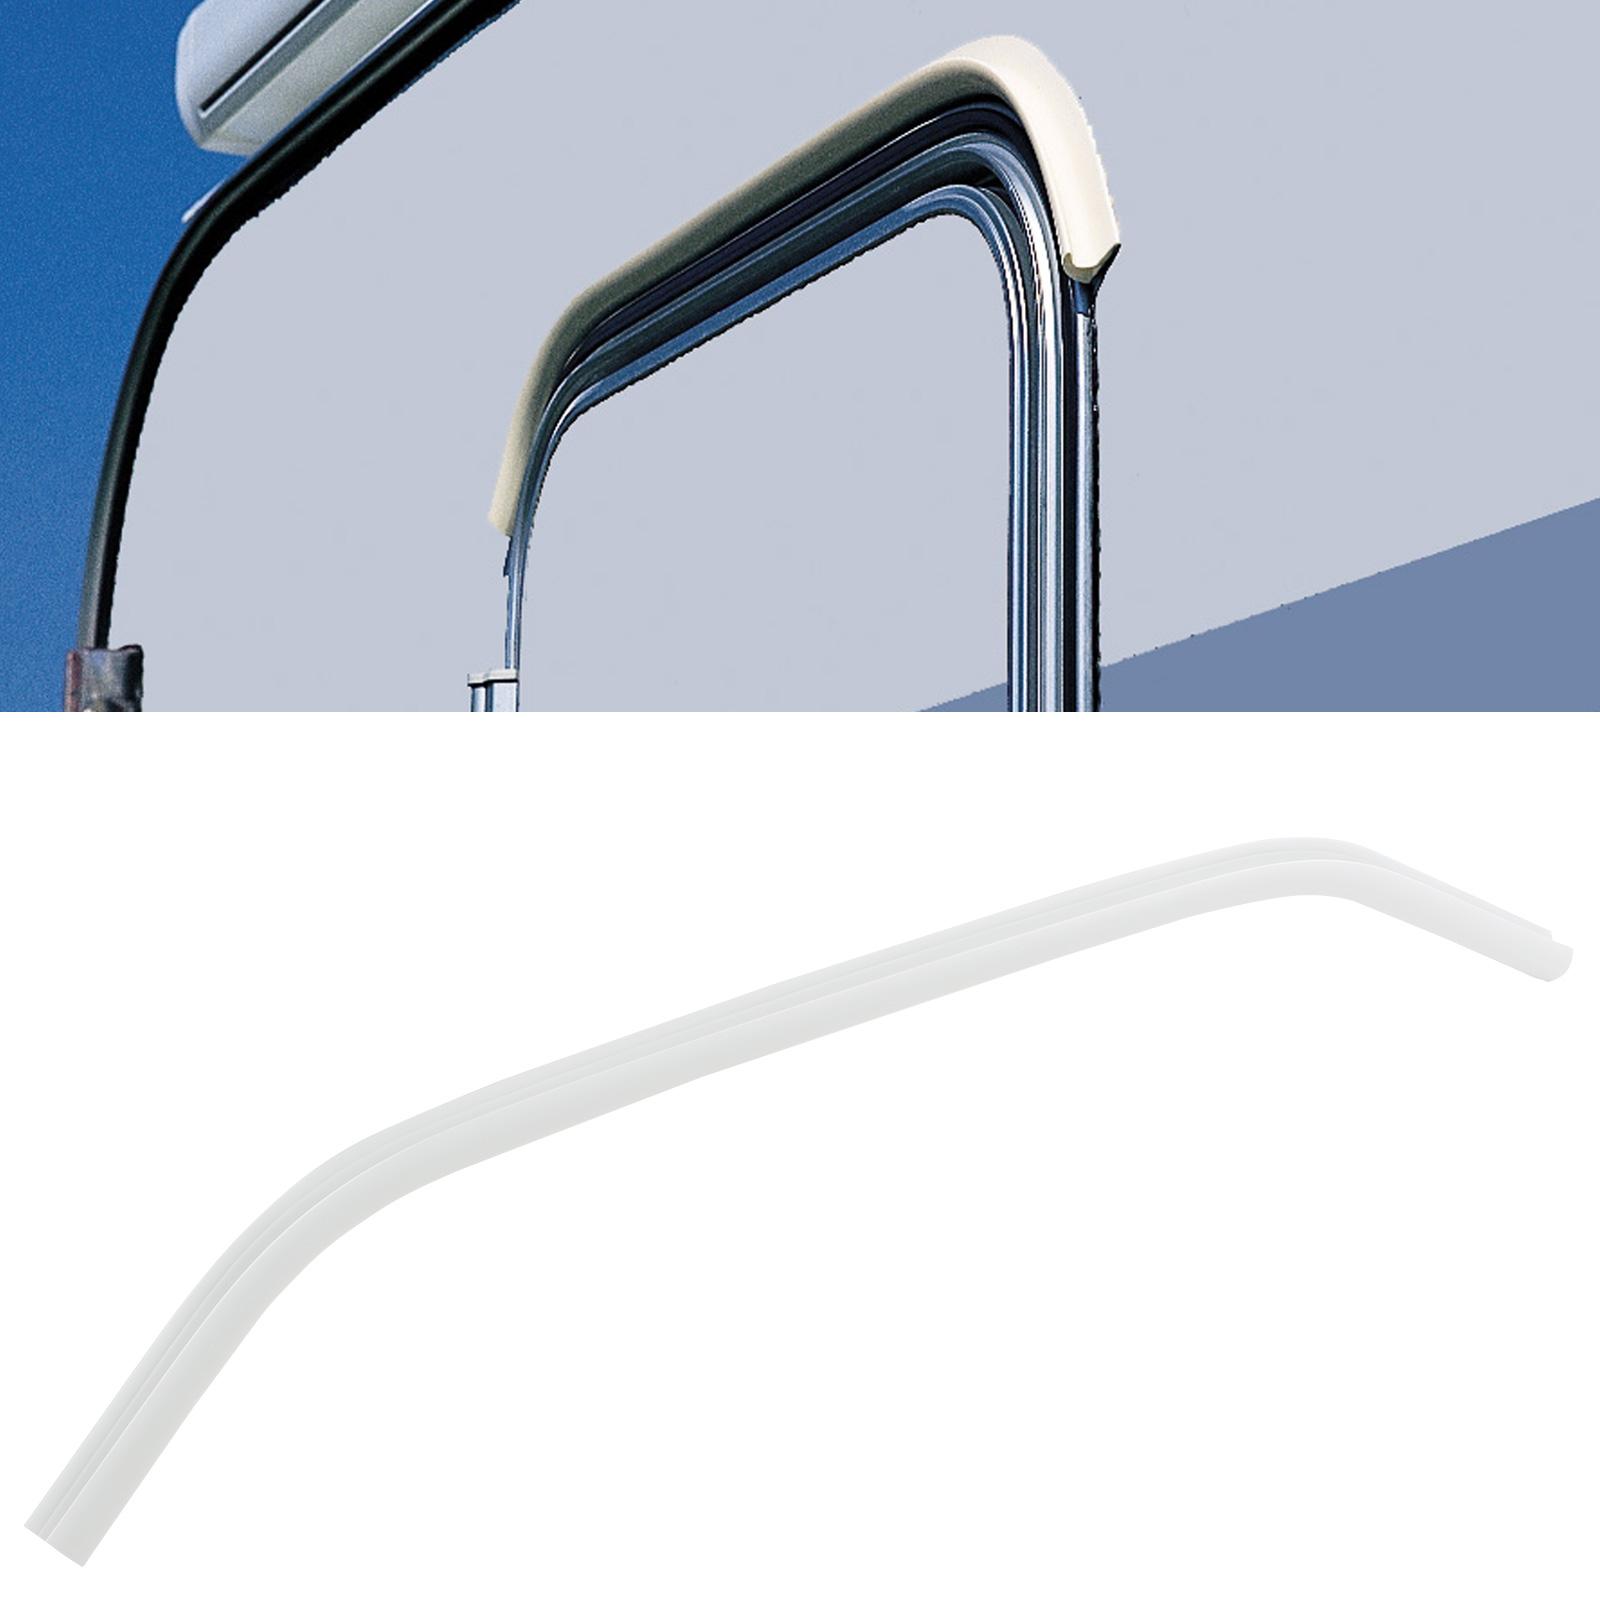 Mini Regenrinne Drip Stop Fiamma, Polyvinylchlorid, 75 cm, weiß